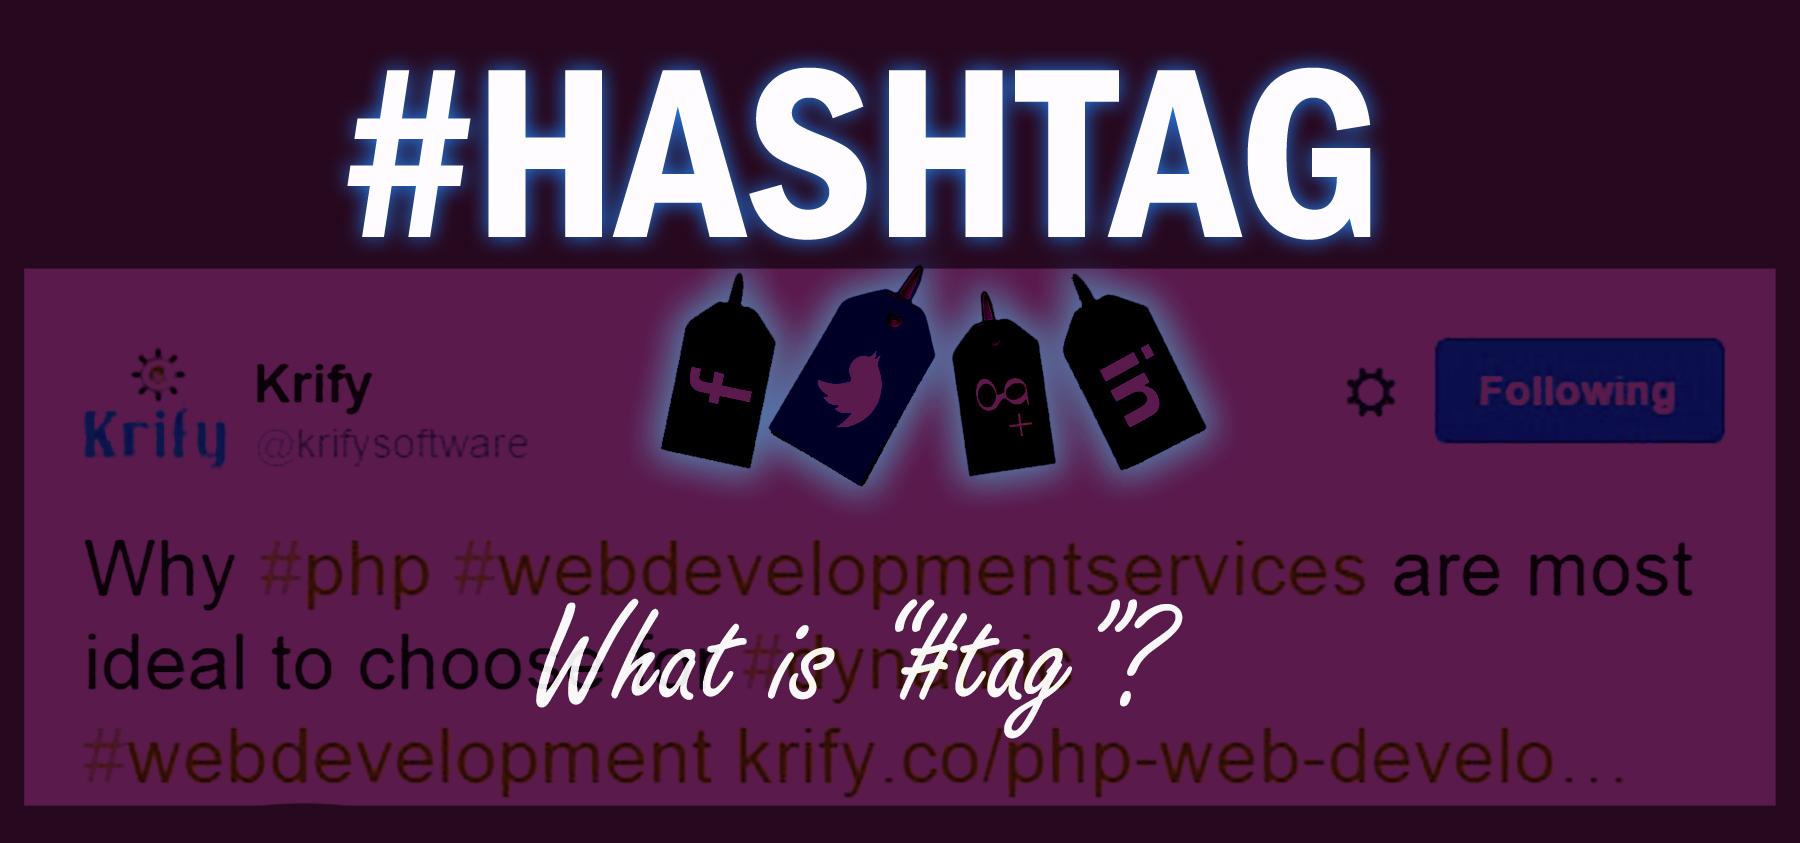 Strategizing Social Media Marketing: With Powerful Hashtags